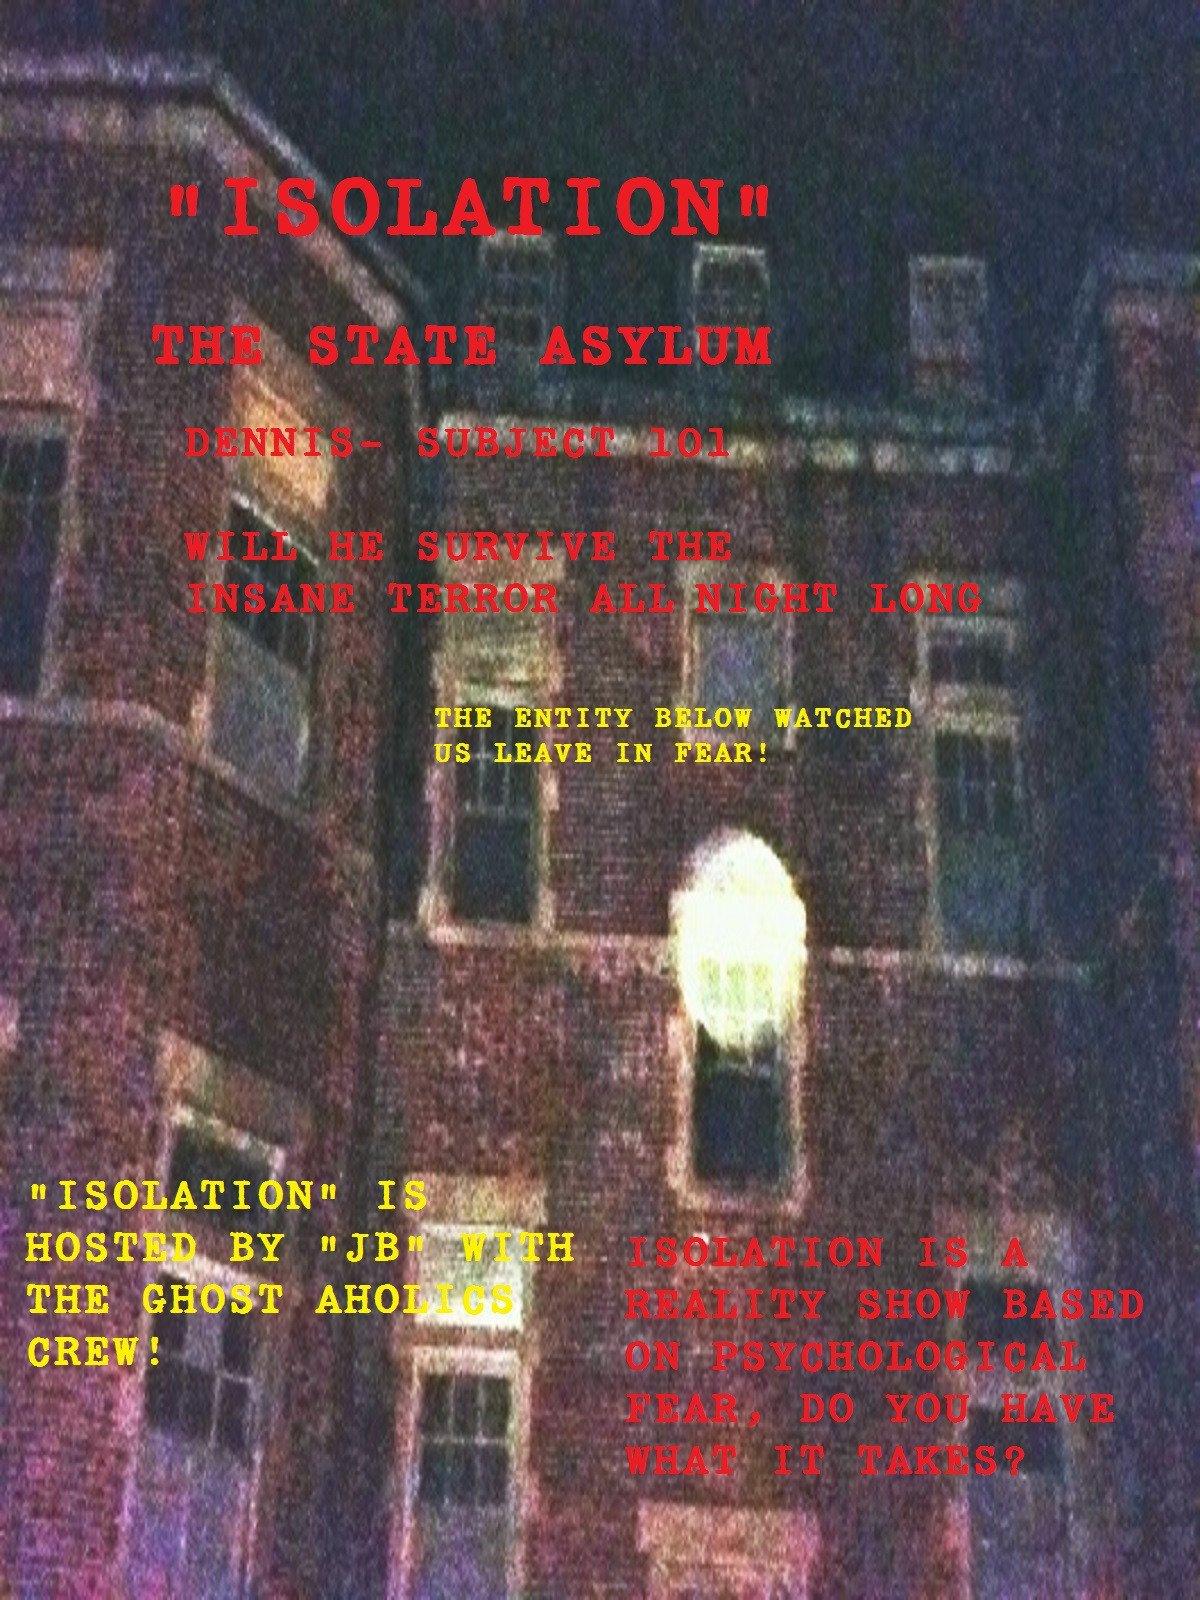 The State Asylum